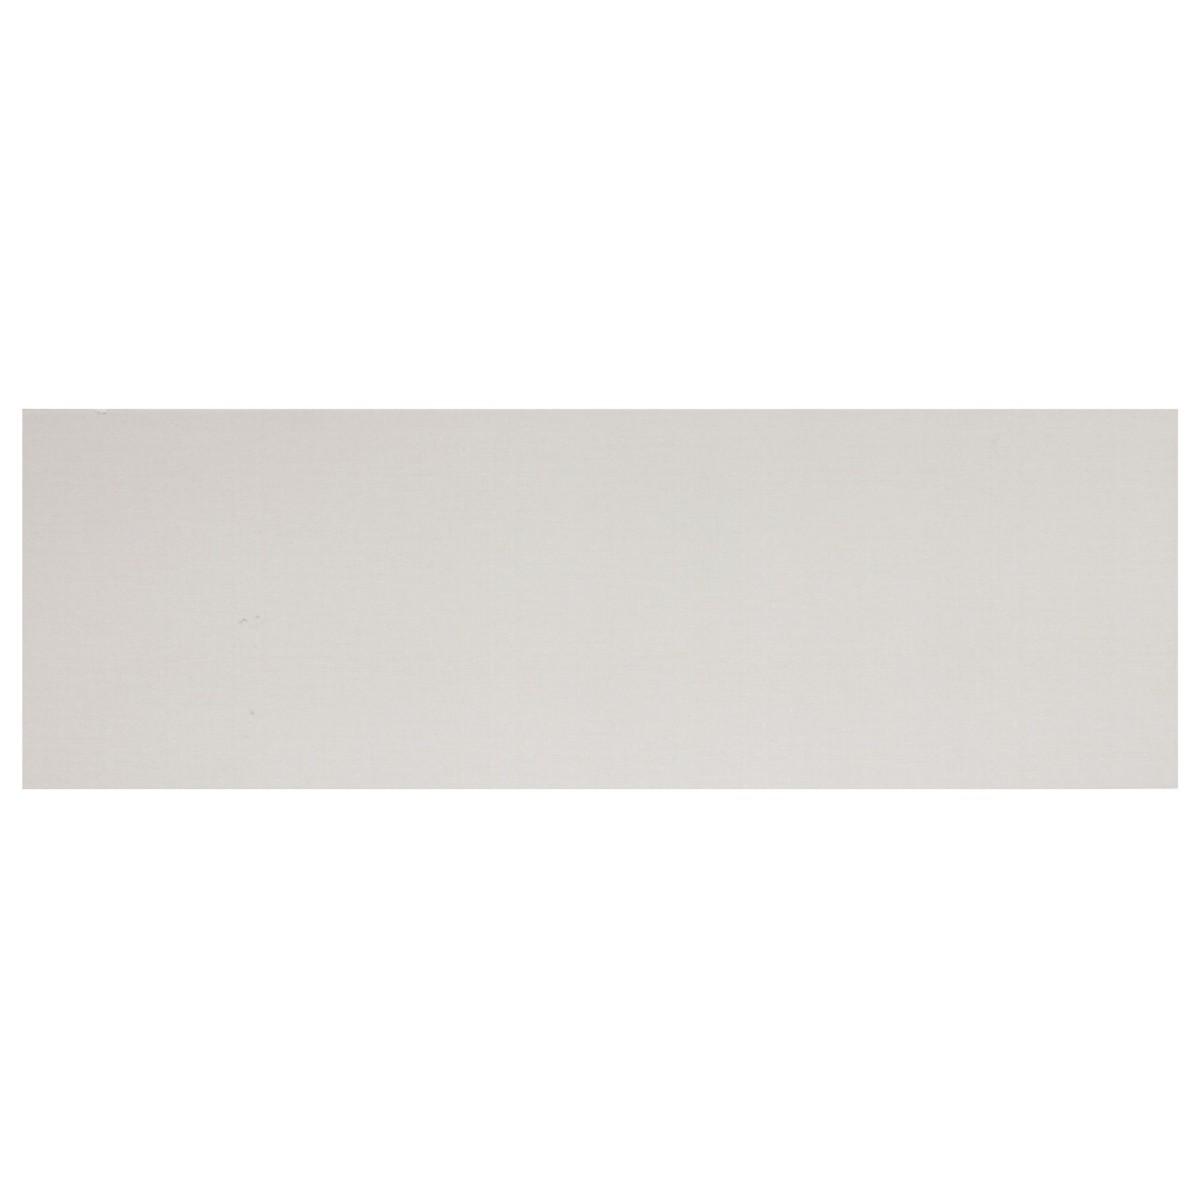 Плитка настенная Милан 20х60 см 1.2 м2 цвет бежевый